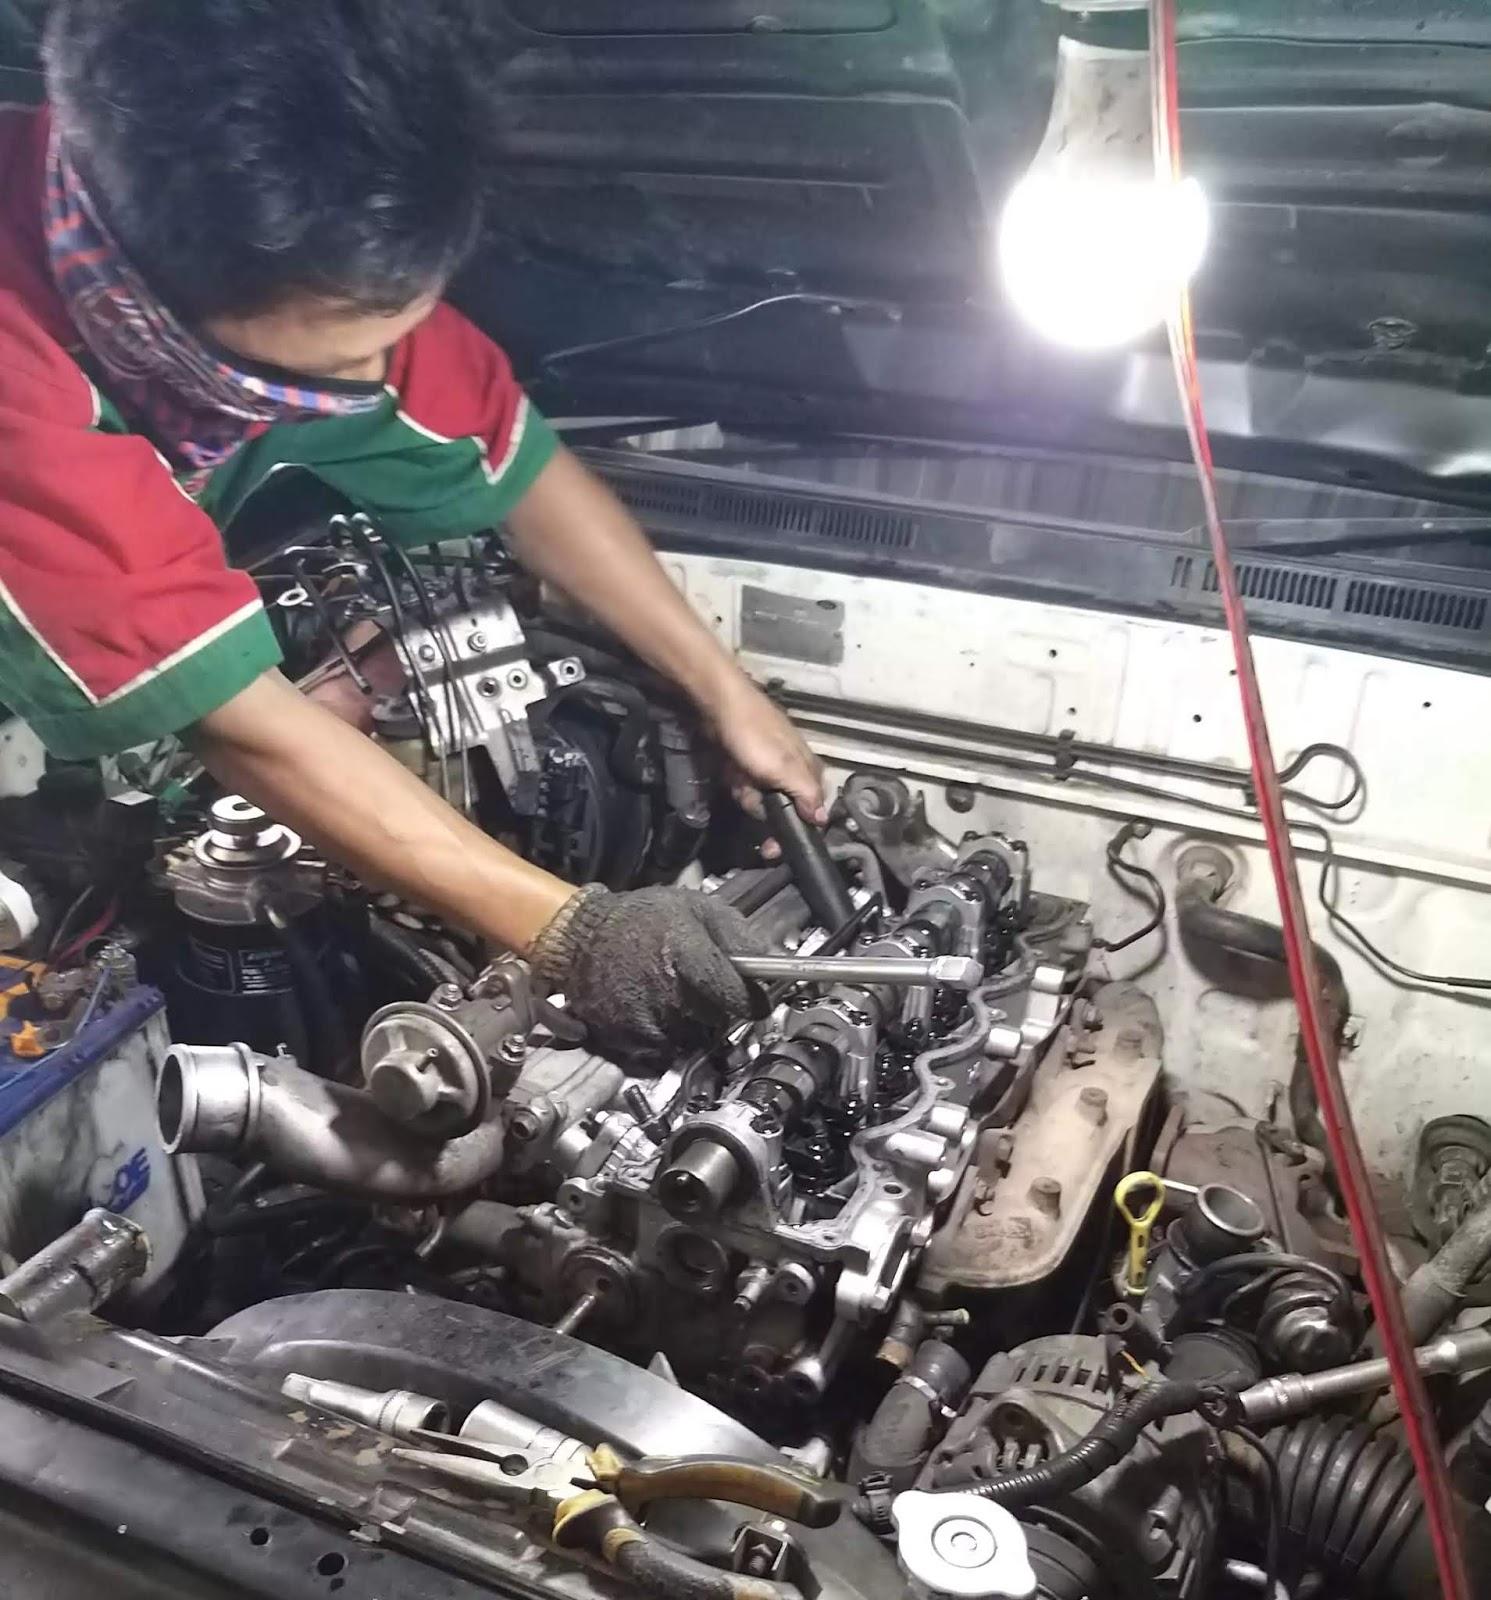 Mekanik Mobil Panggilan Surabaya 24 Jam Murah Bengkel Mobil Dan Servis Mobil Panggilan Surabaya 08113465899